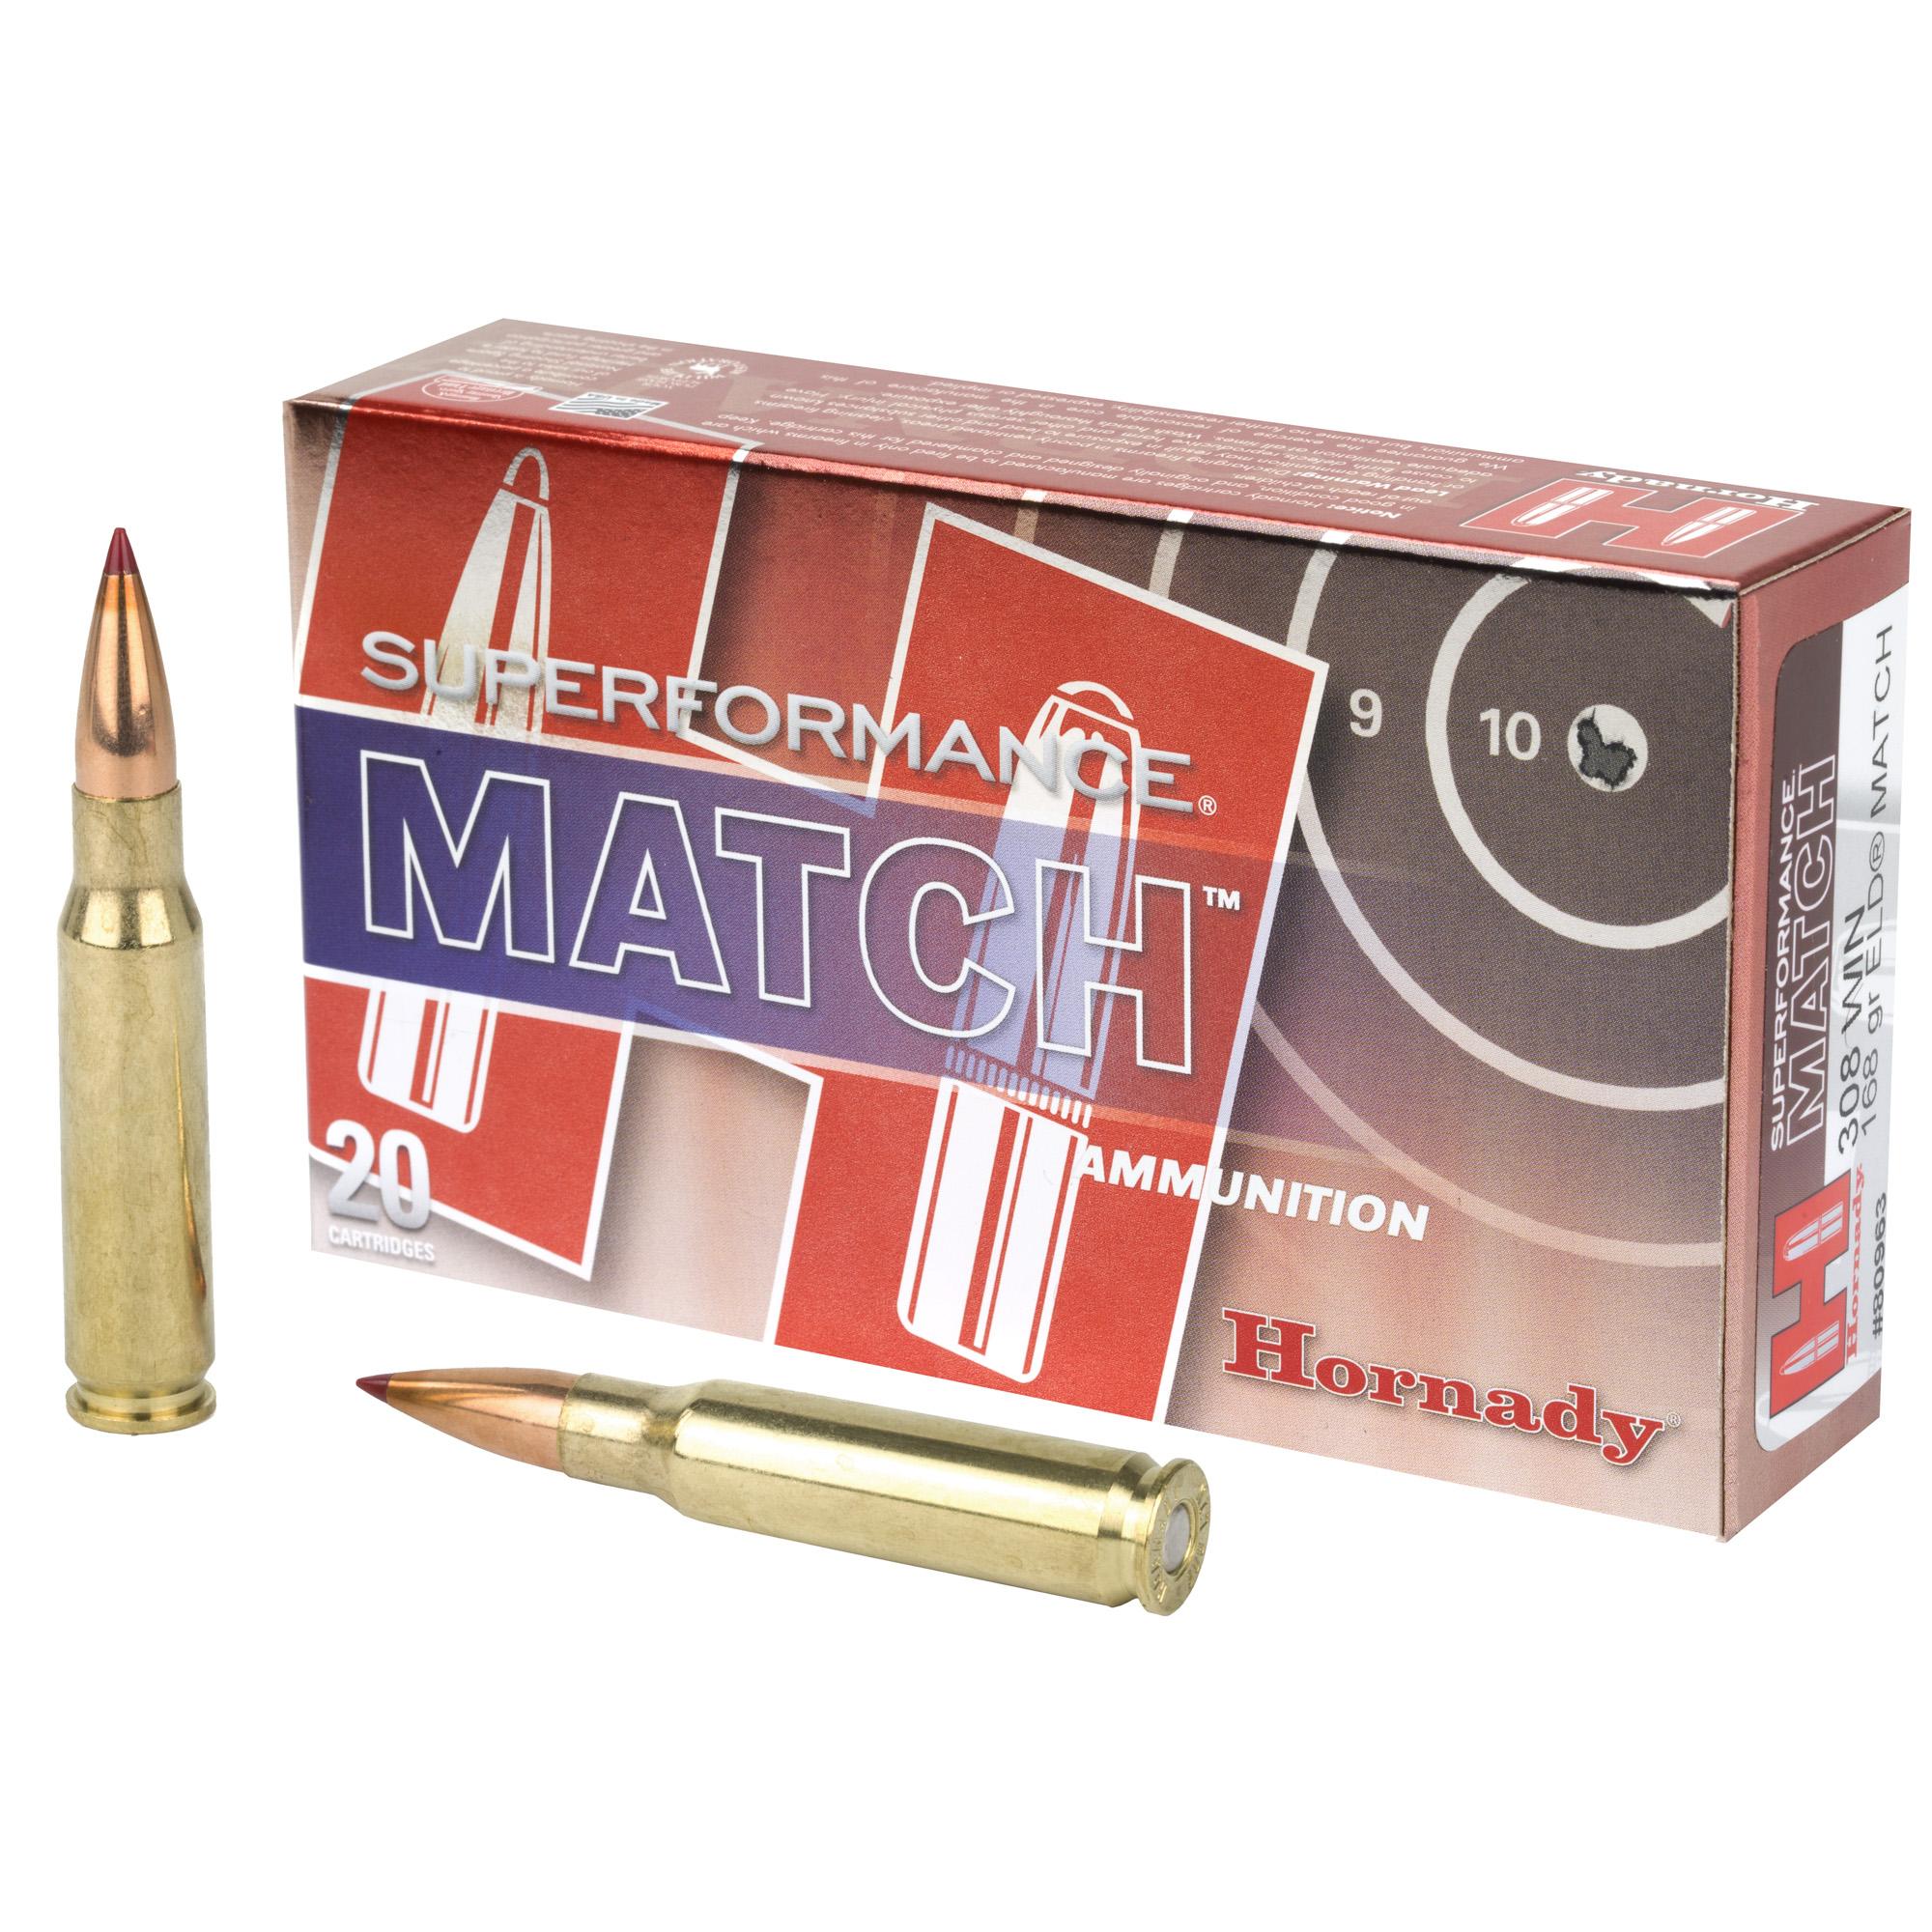 Hornady Superformance 308 Winchester 168gr ELD Match 20 Round Box